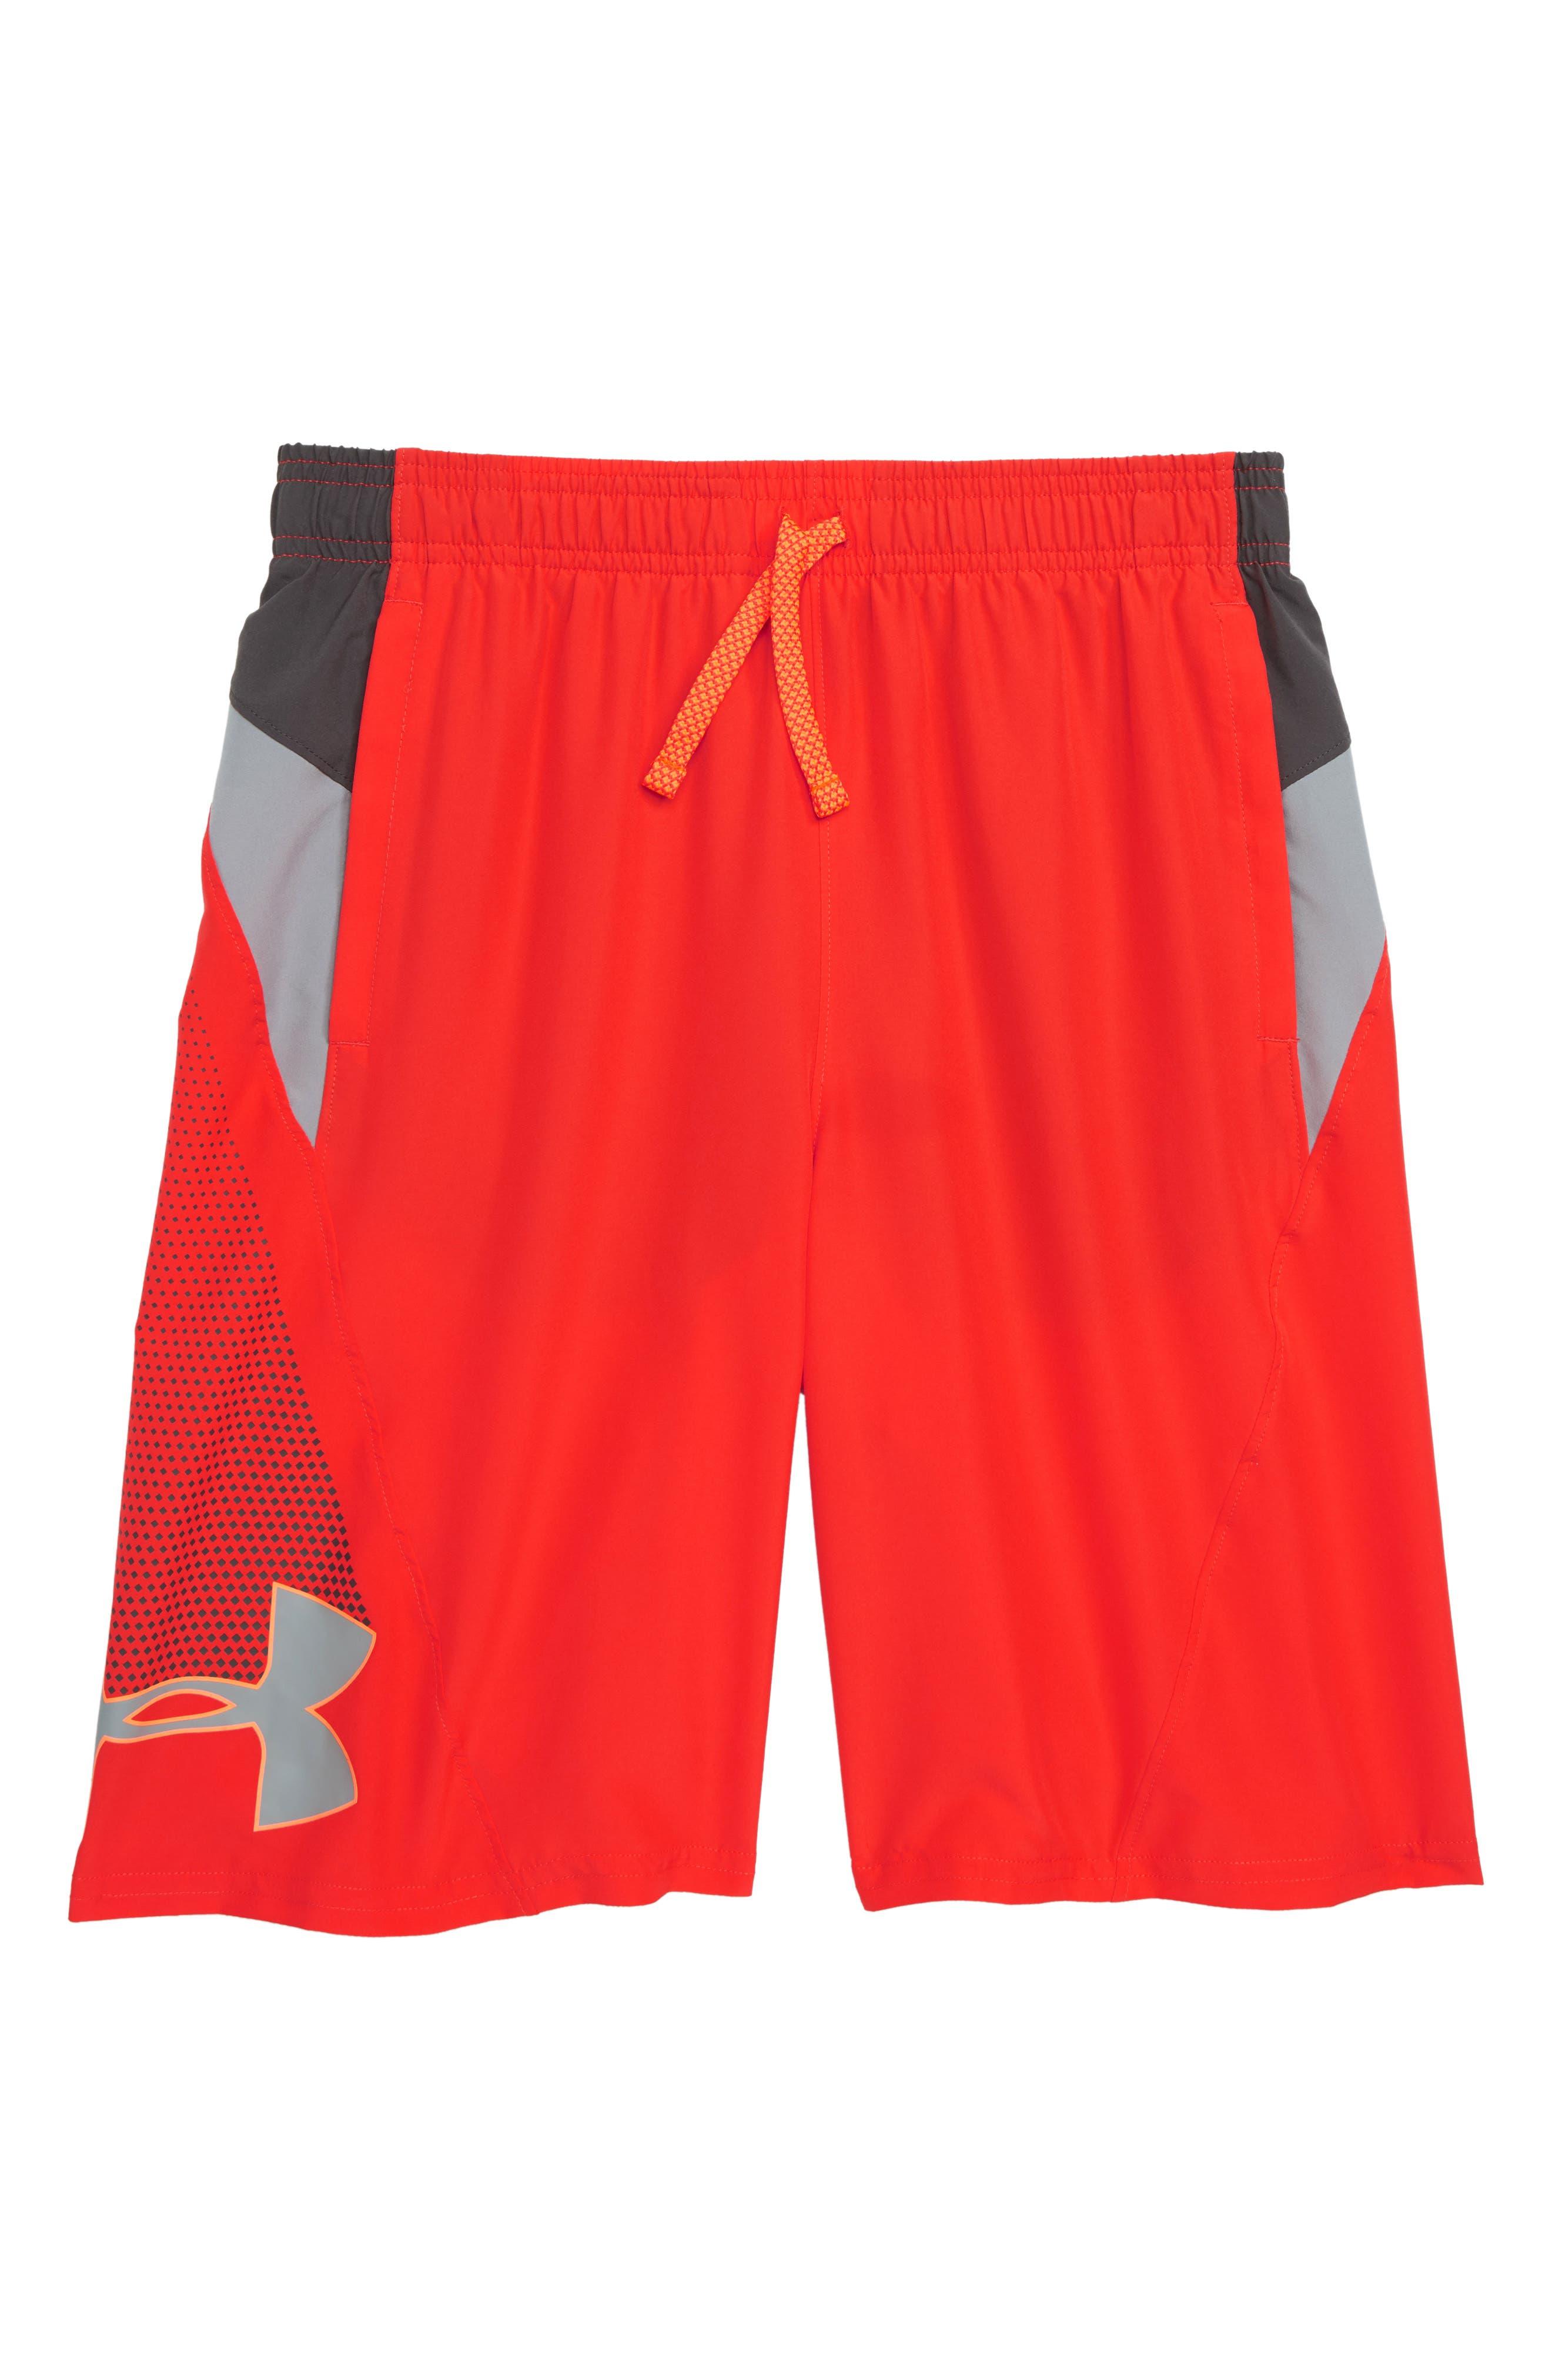 Evolve HeatGear<sup>®</sup> Woven Shorts,                             Main thumbnail 1, color,                             RADIO RED/ CHARCOAL